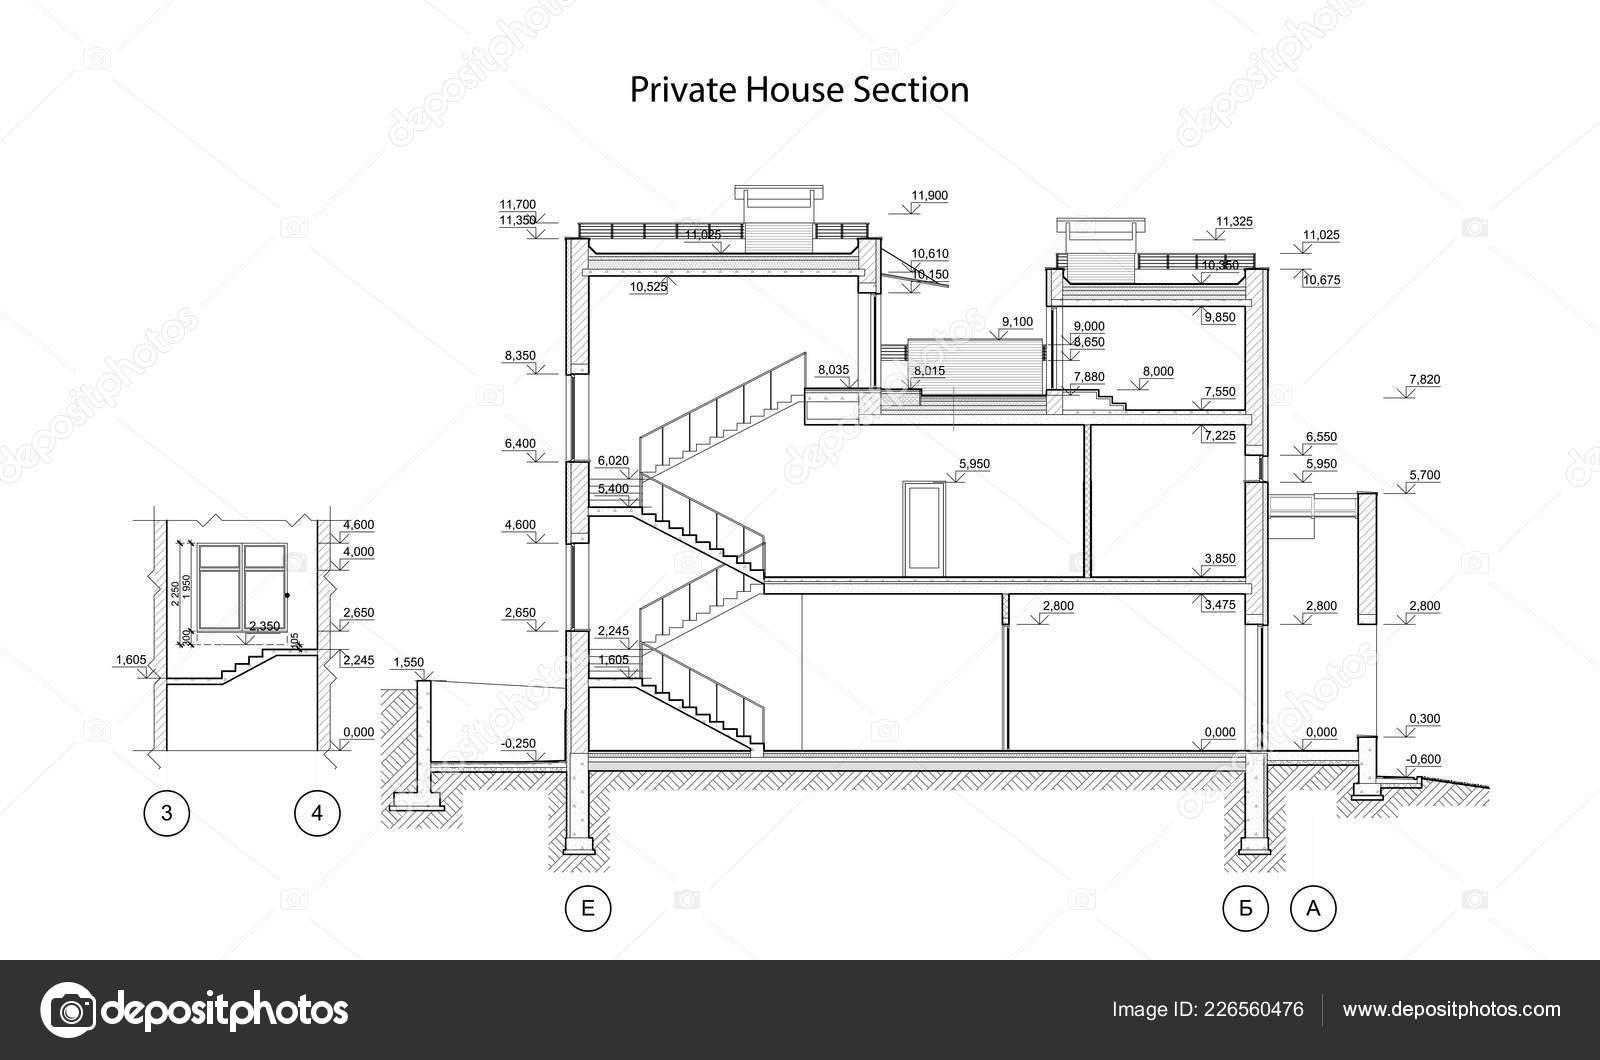 Rodinny Dum Sekce Detailni Architektonicke Technicky Vykres